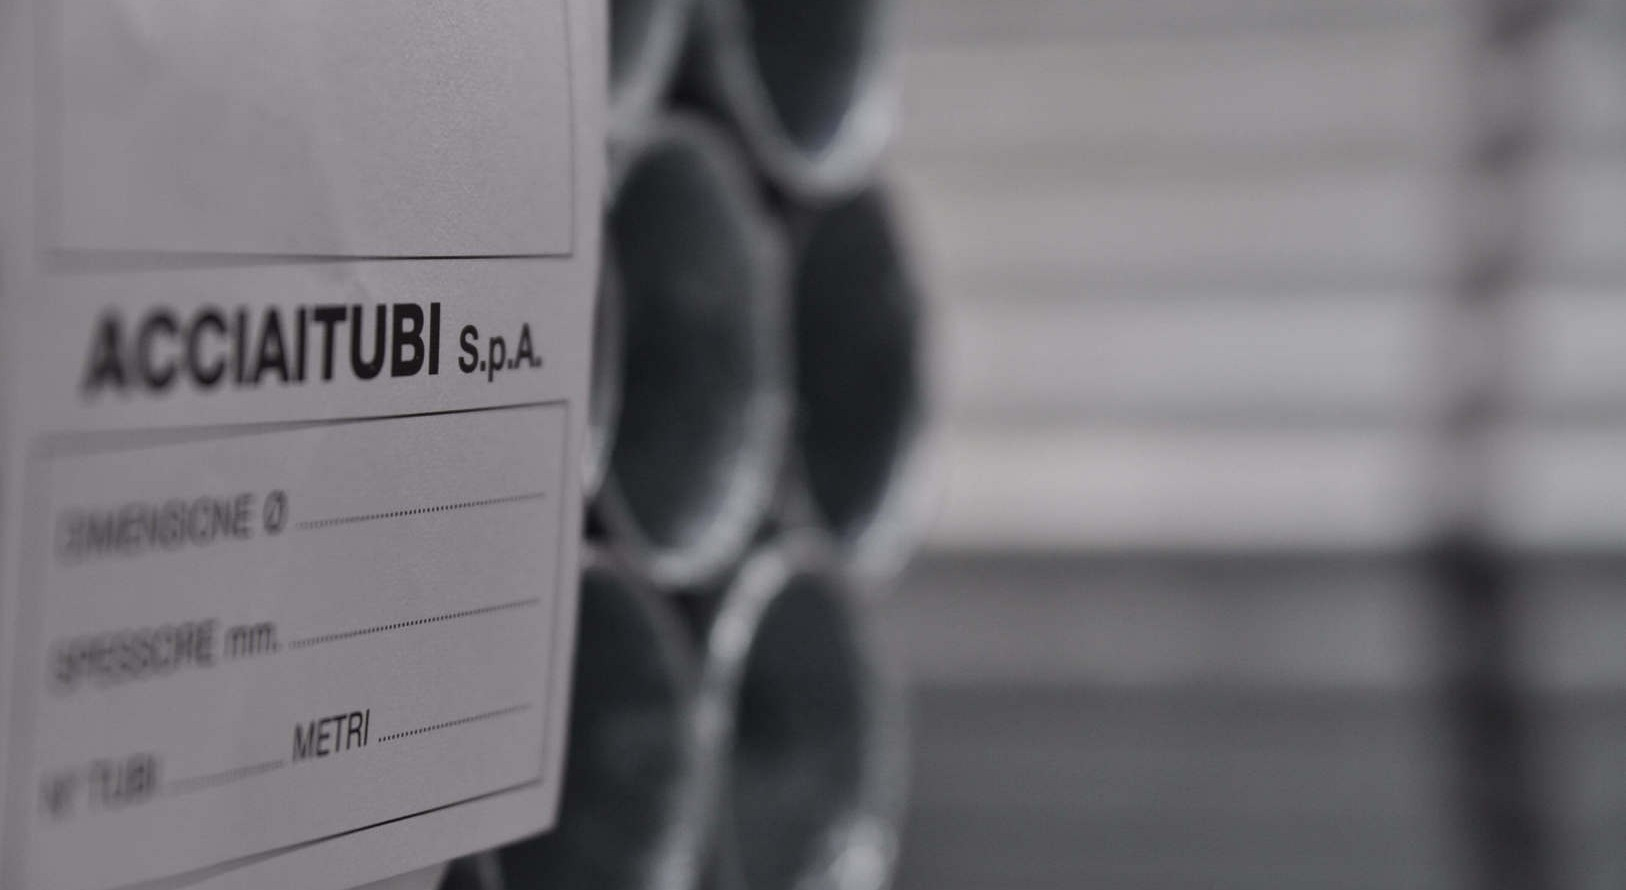 Acciaitubi steel tube certifications